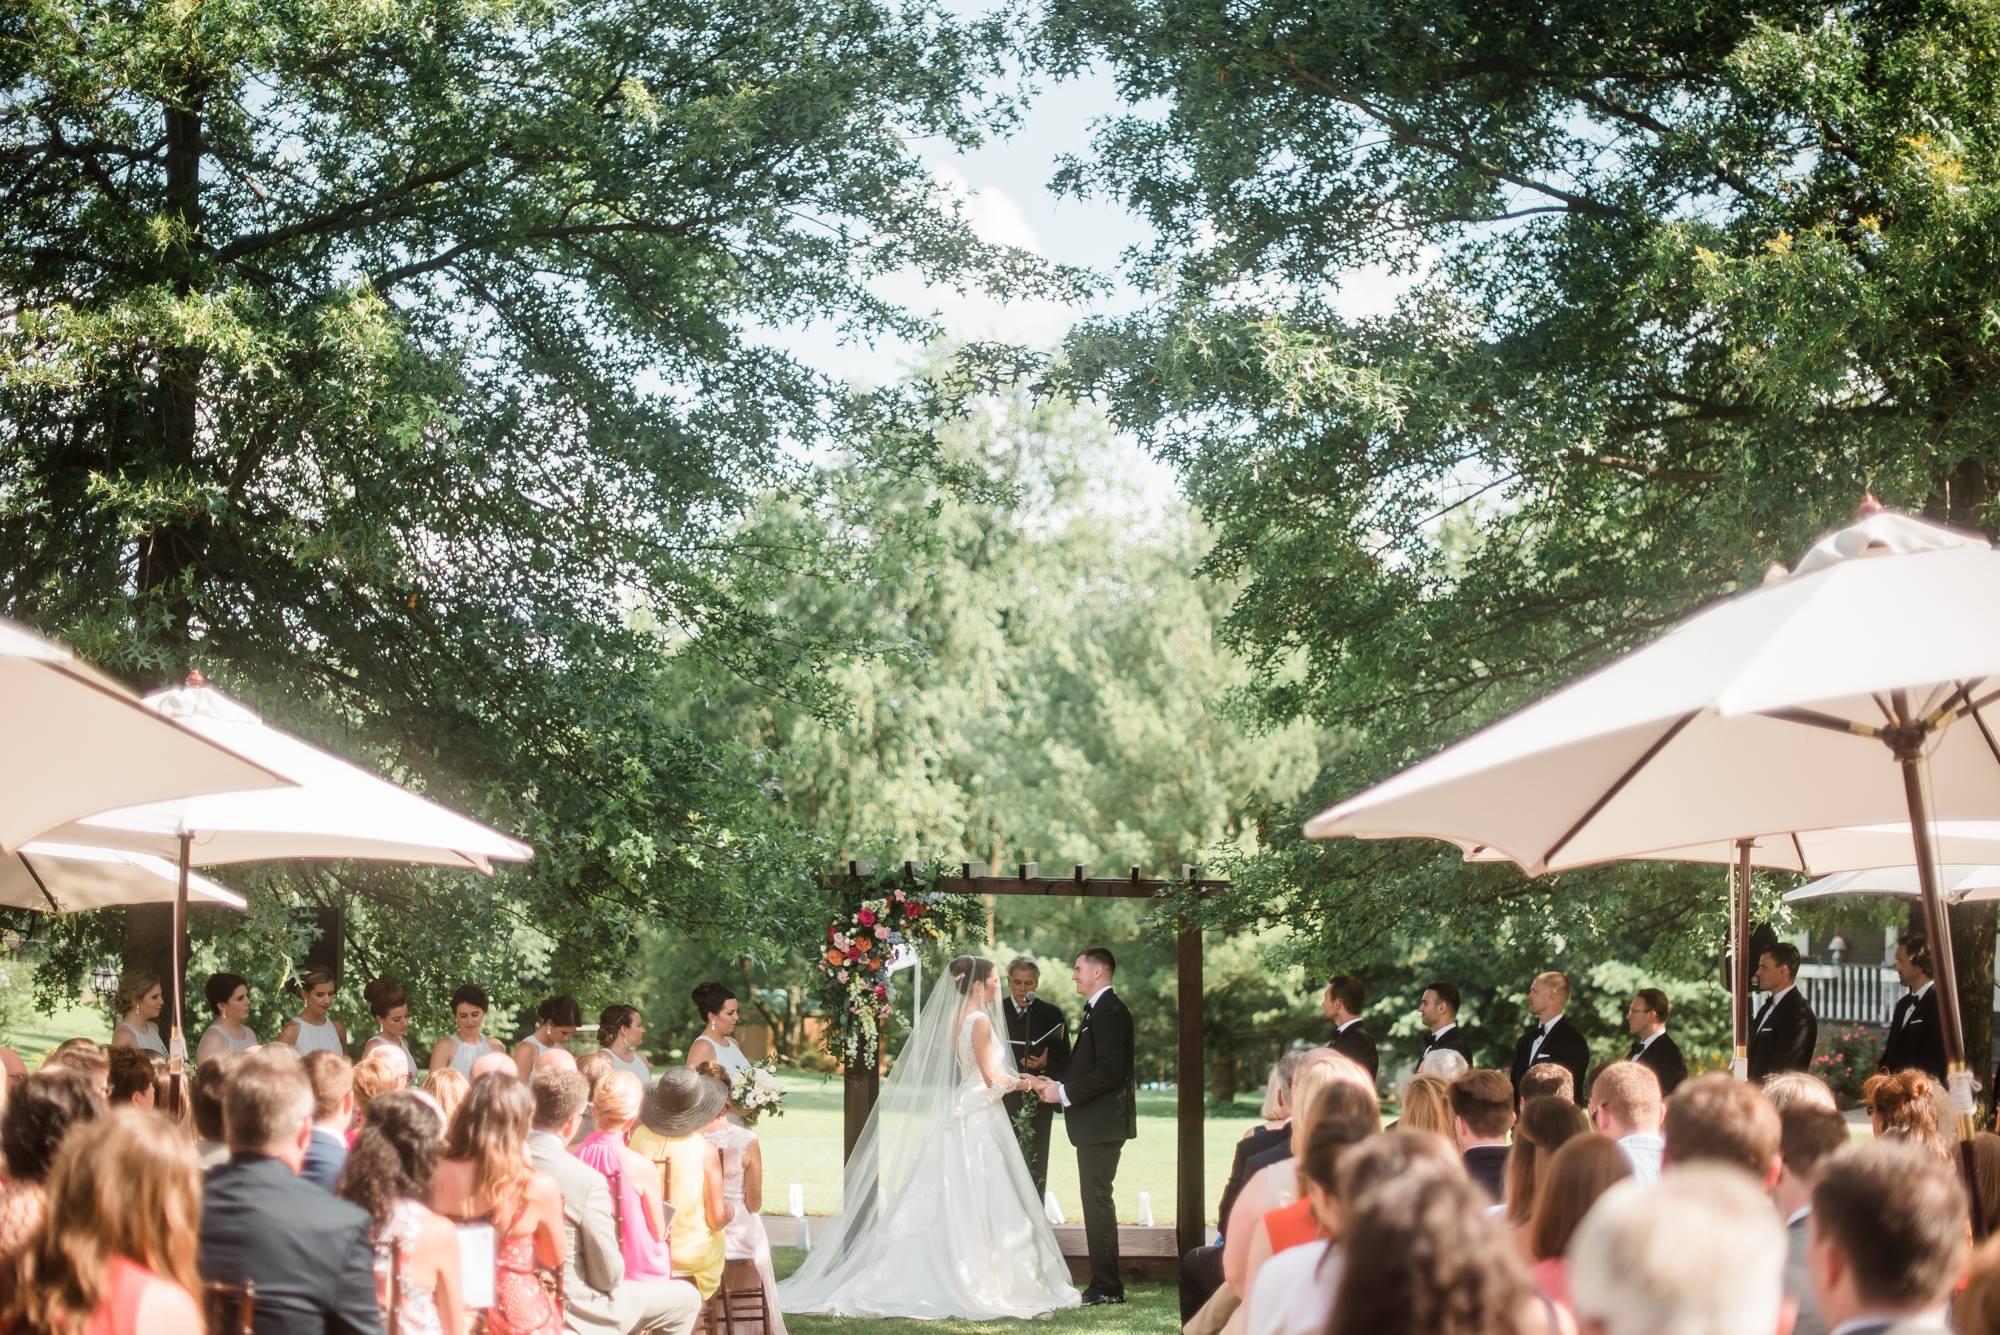 pittsburgh-pennsylvania-backyard-glam-chic-modern-classic-wedding-0023.jpg